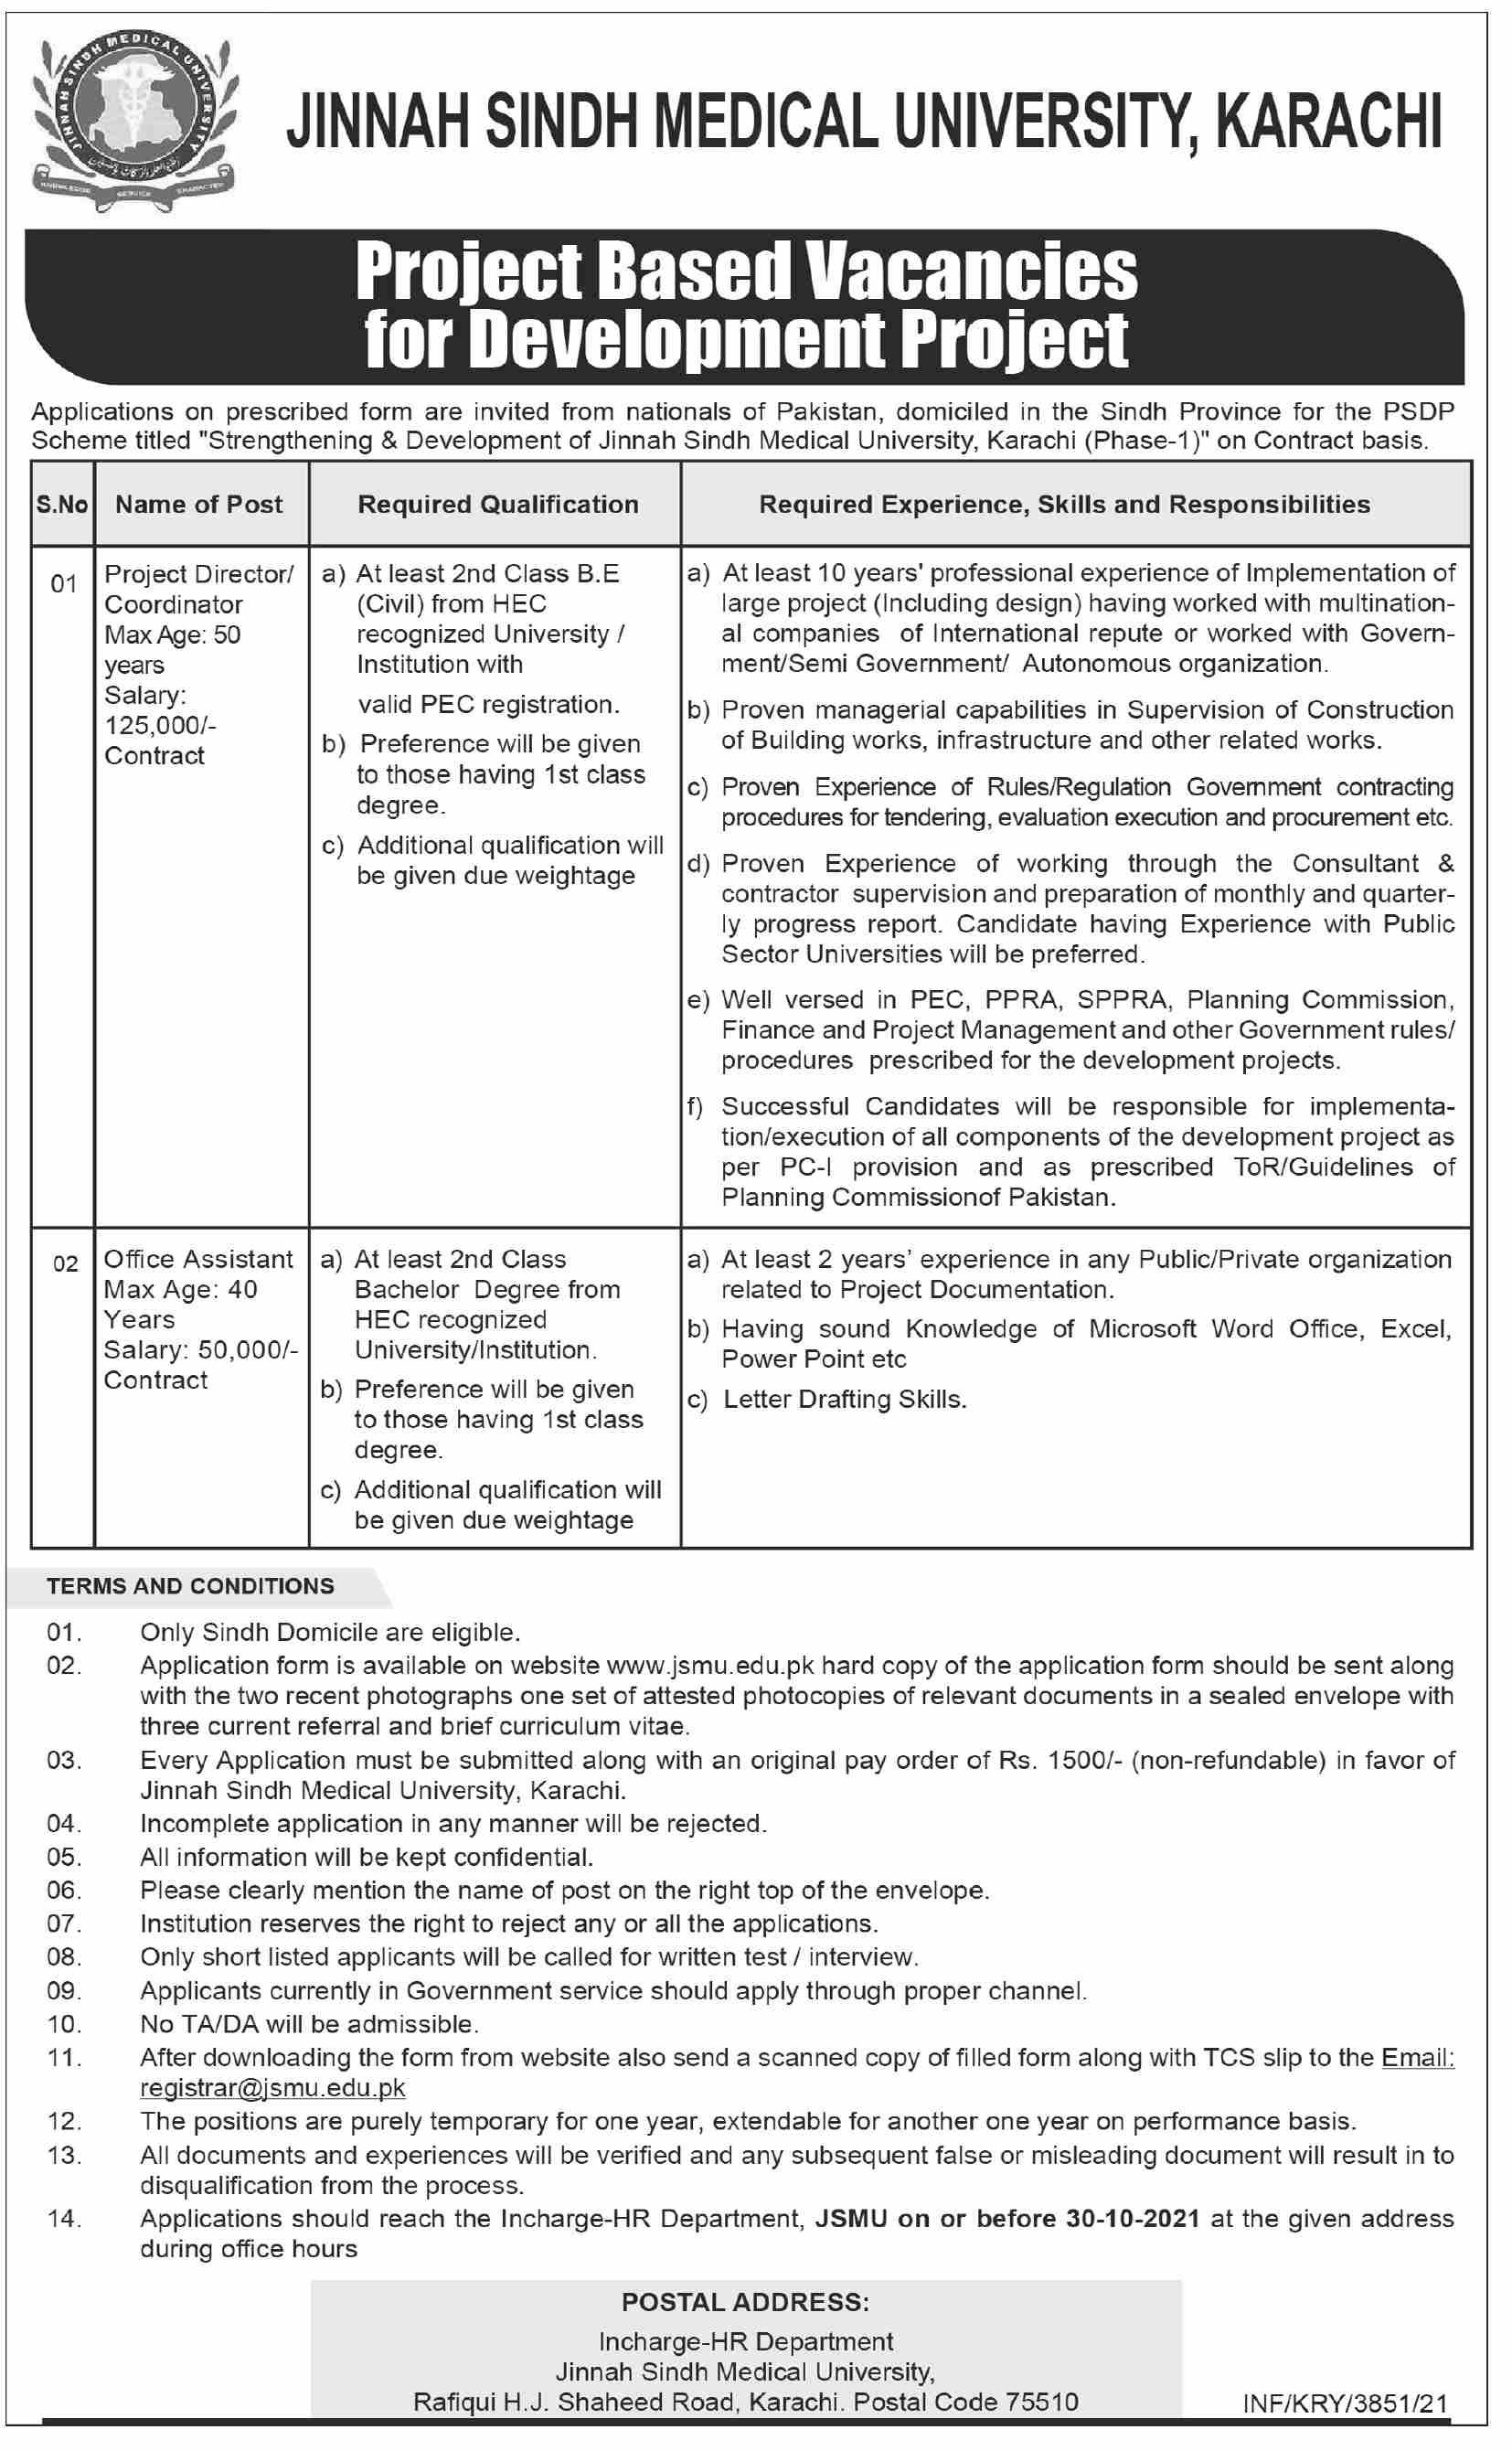 Jinnah Sindh Medical University JSMU Jobs 2021 for Directors